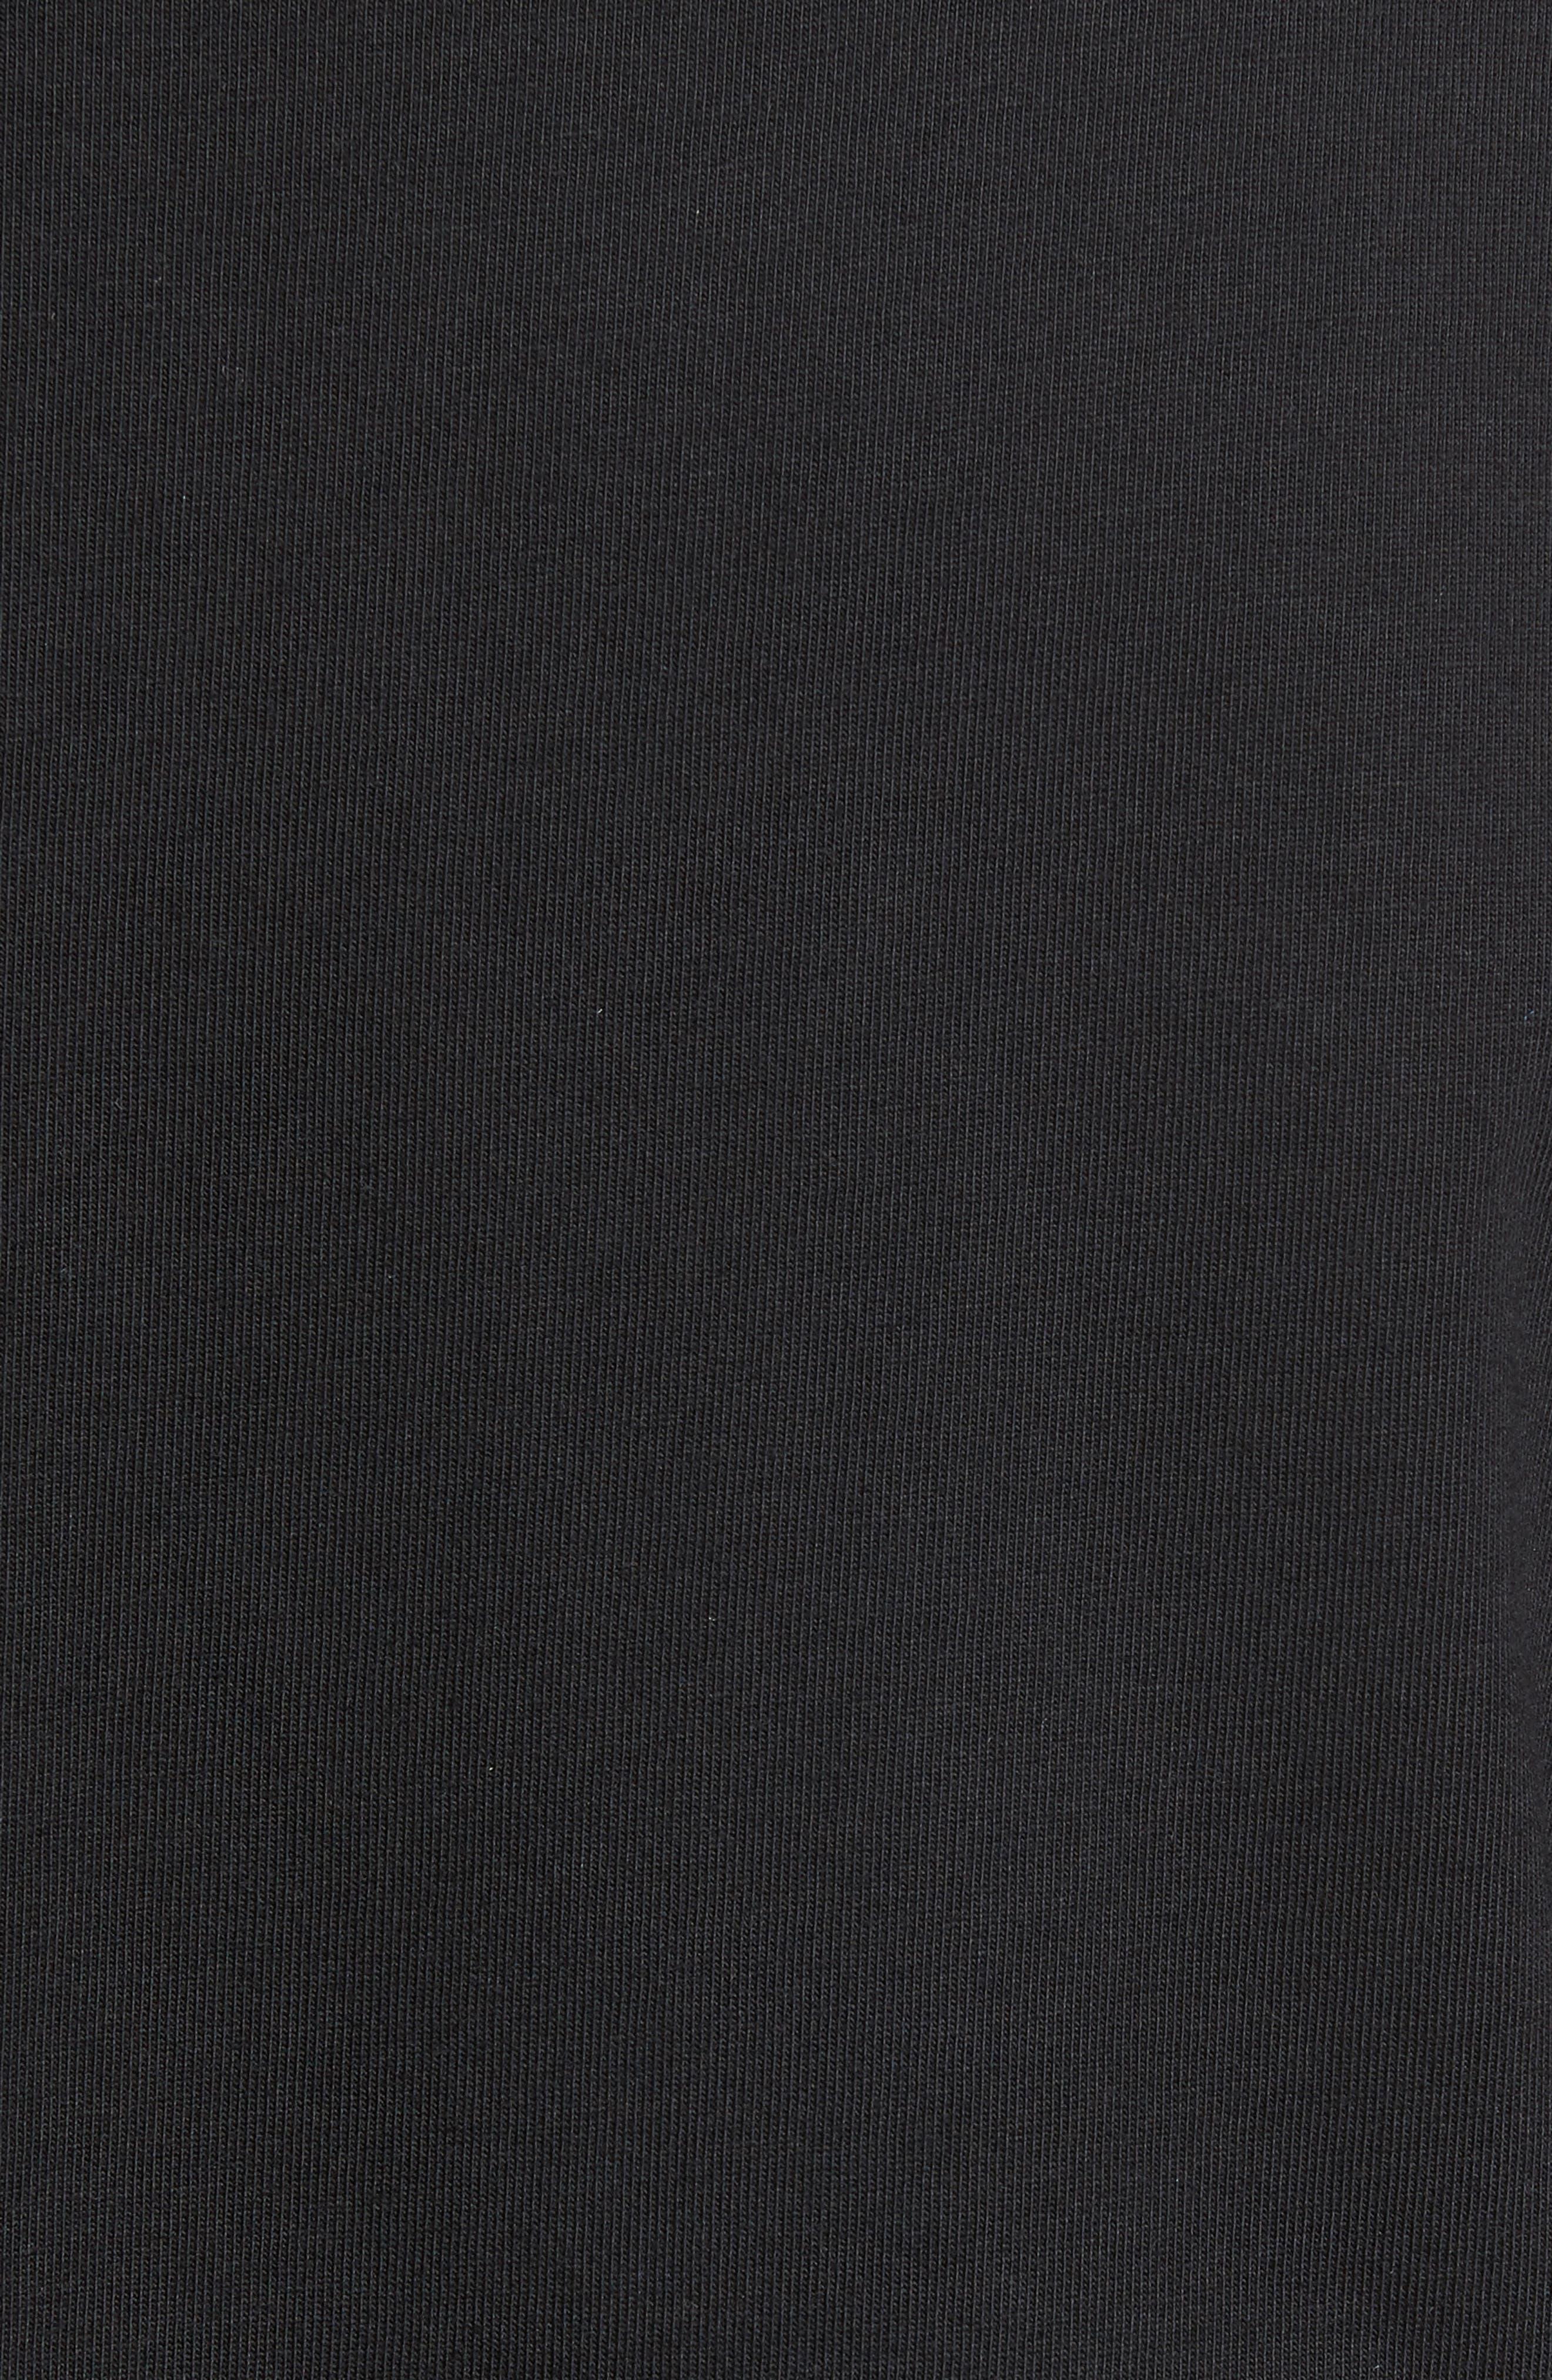 AC Boxy Oversize T-Shirt,                             Alternate thumbnail 2, color,                             001